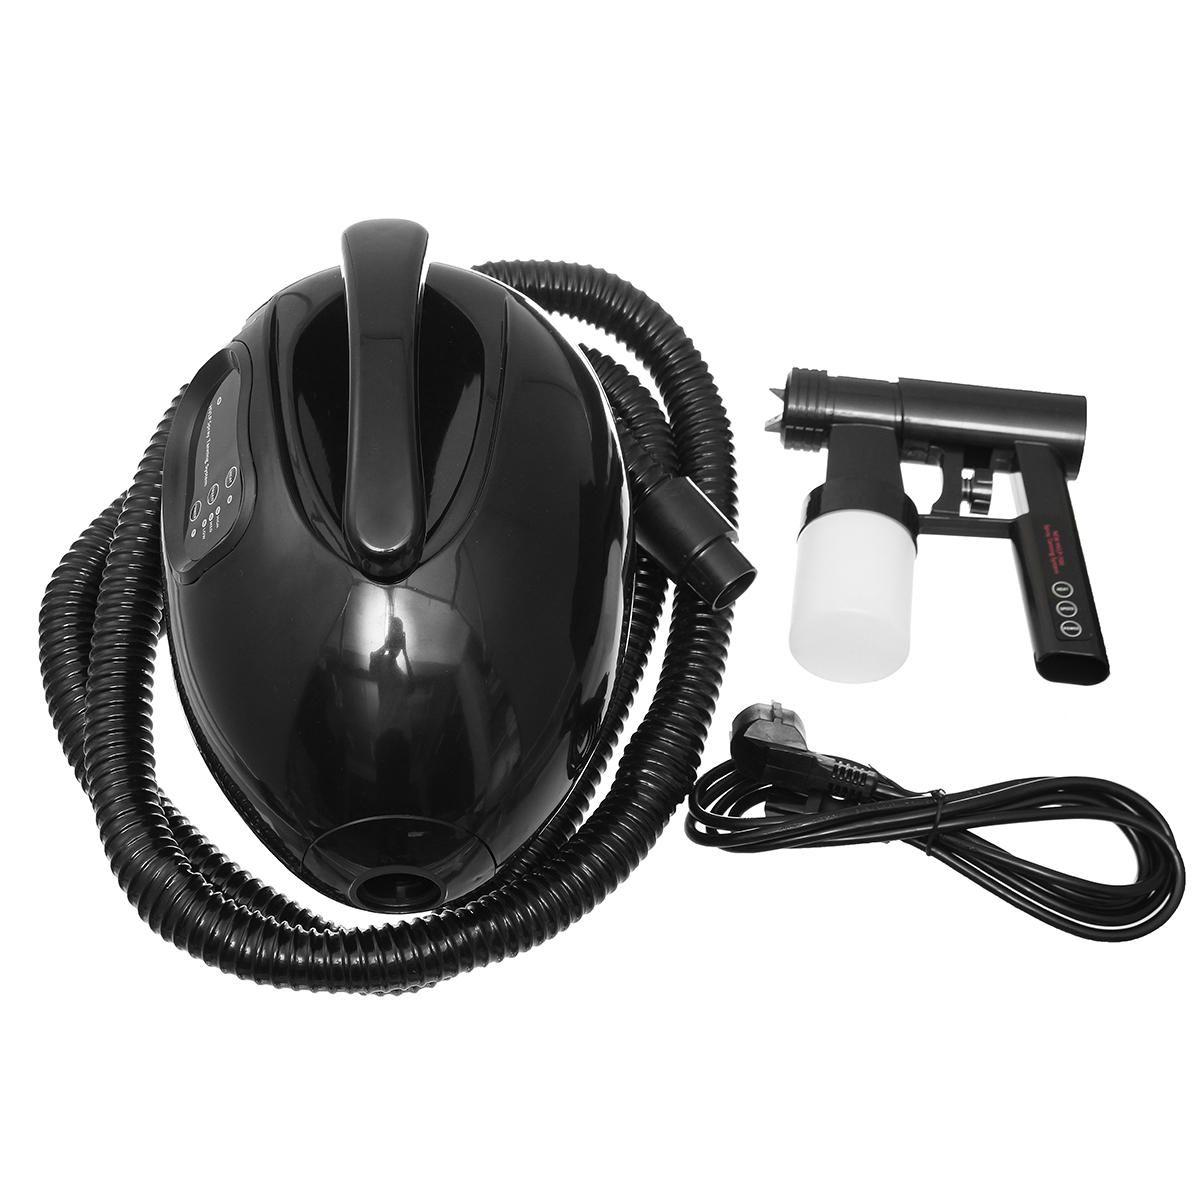 Electric Spray Tanning Kit Body Tanner Bronzer Machine